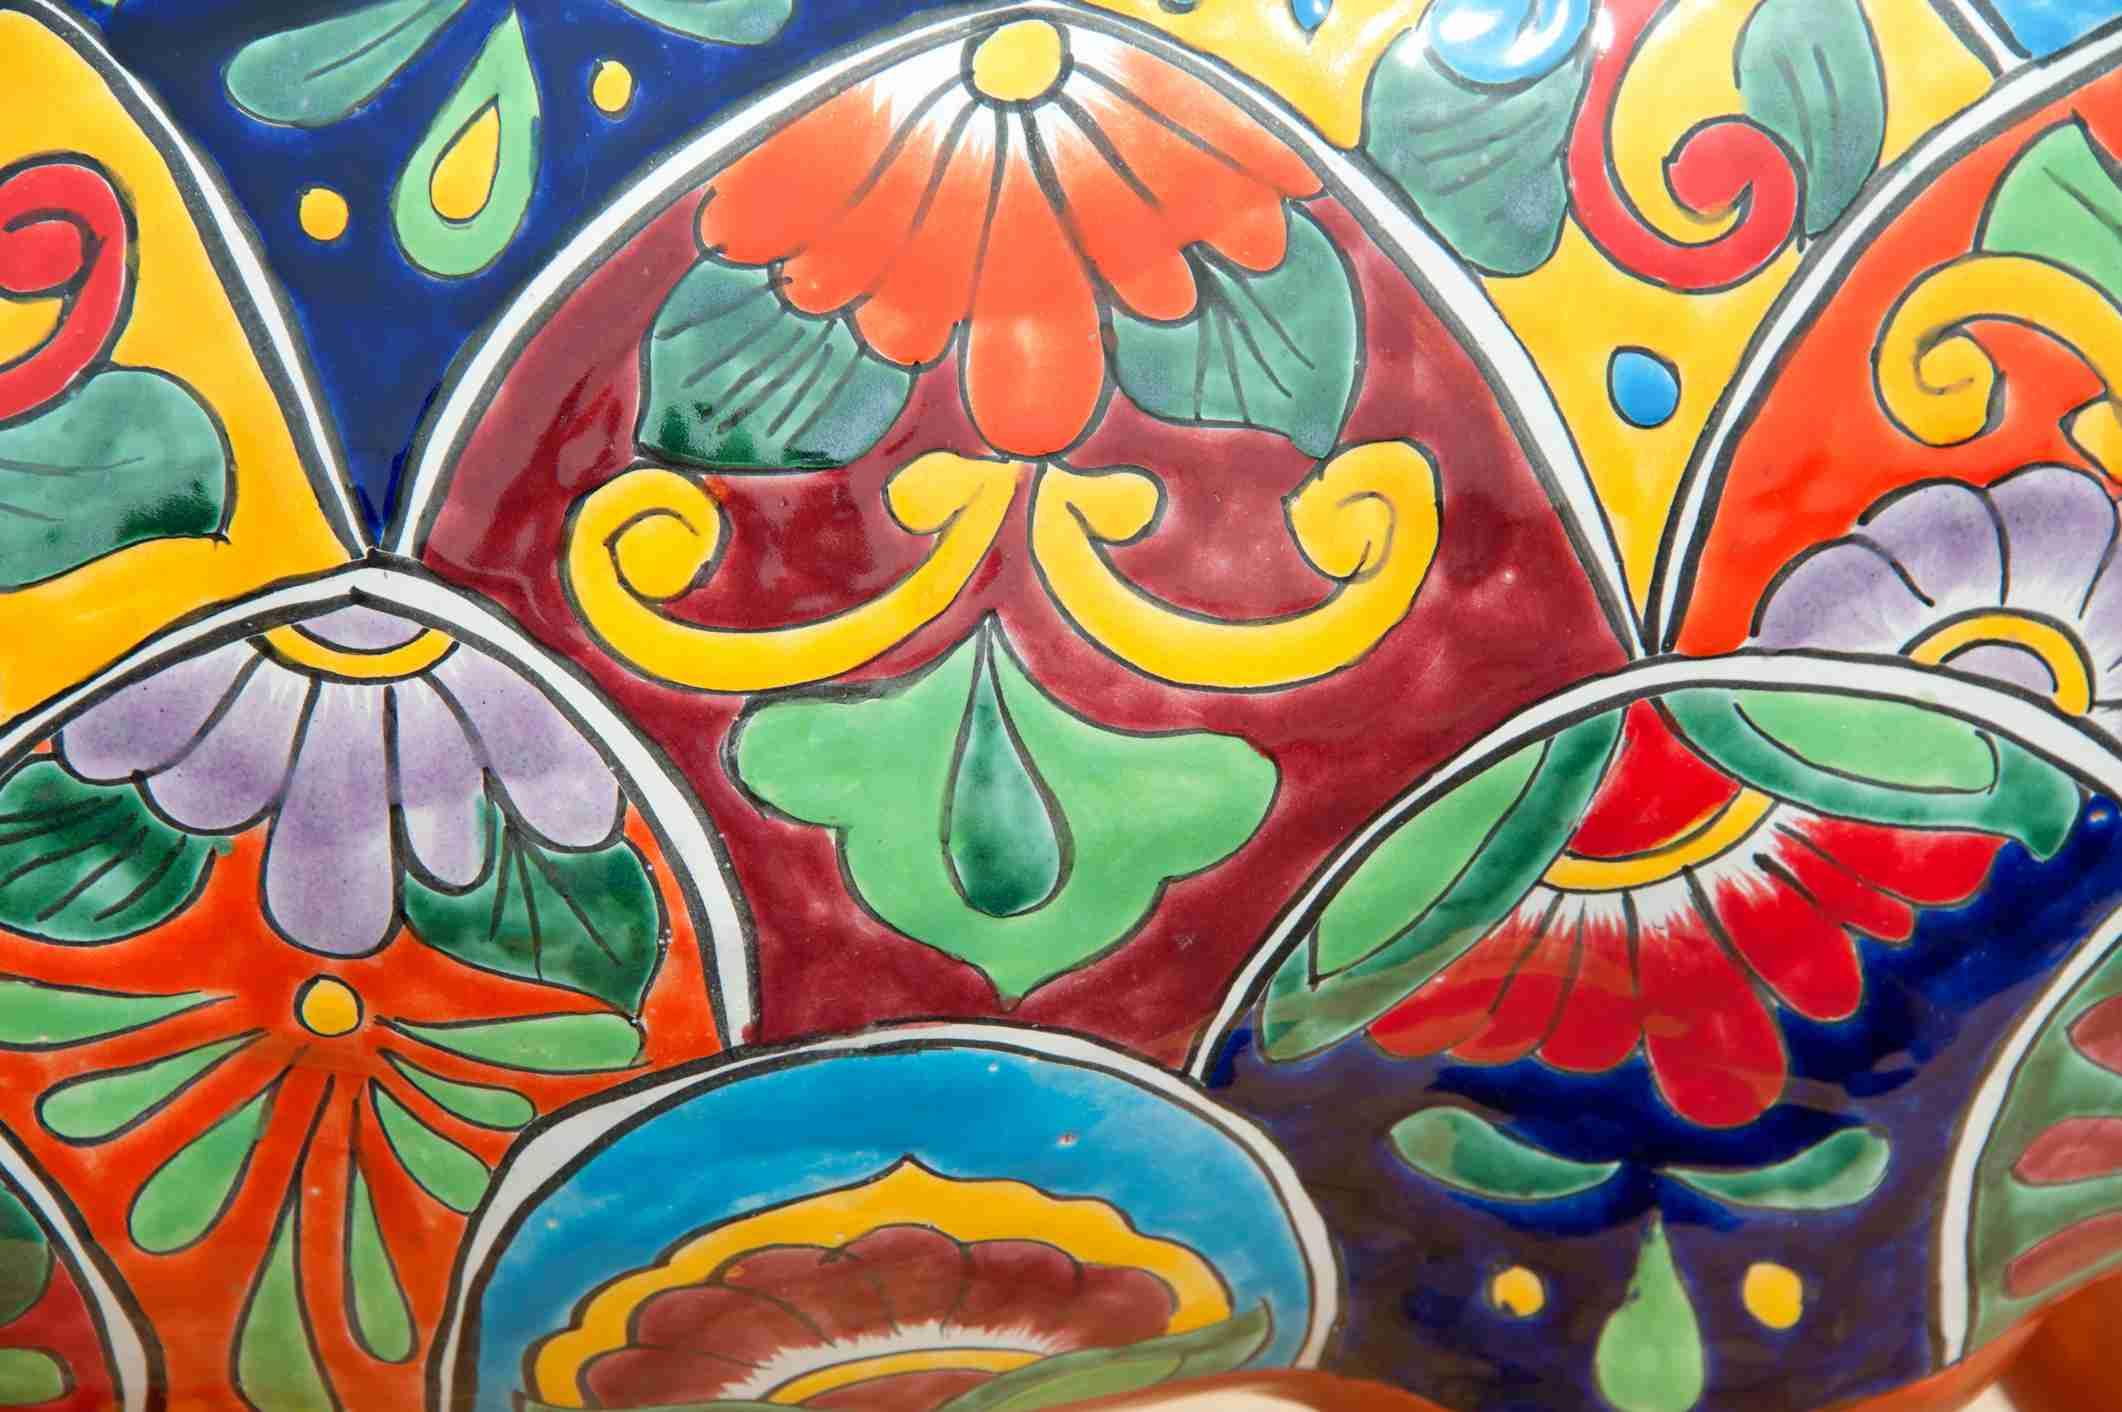 Detail on Talavera pottery